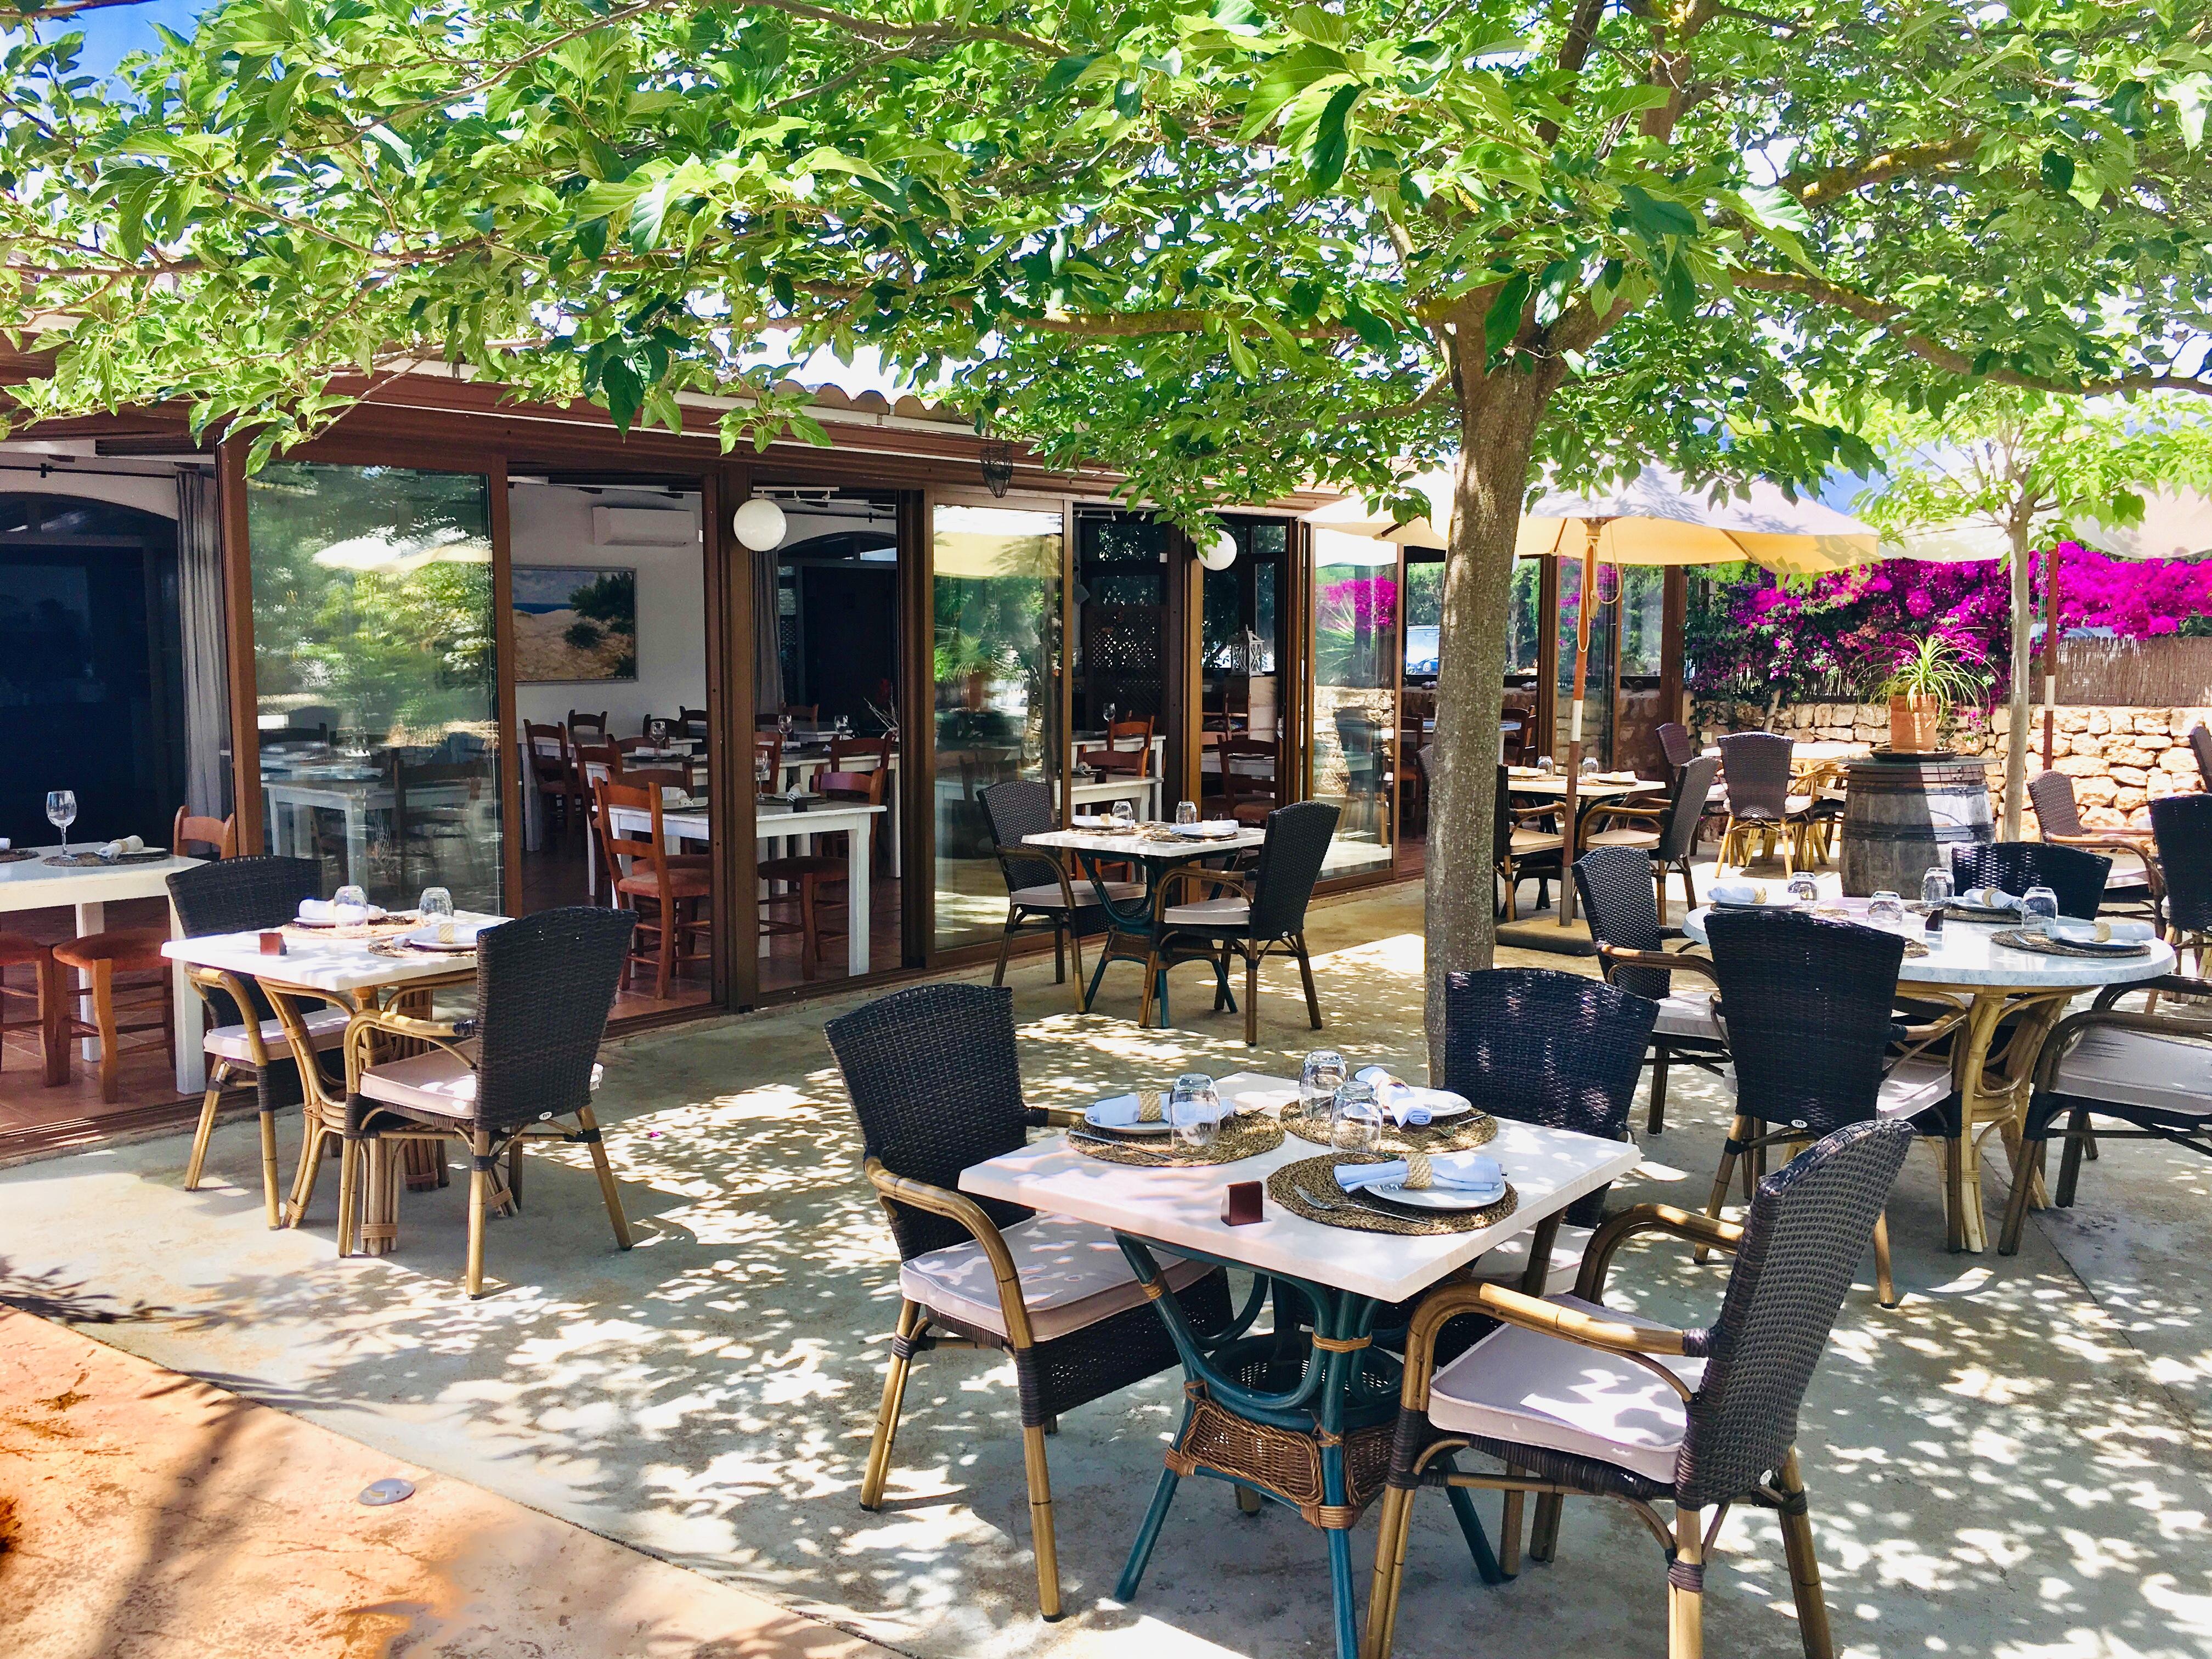 Terraza restaurante 2019